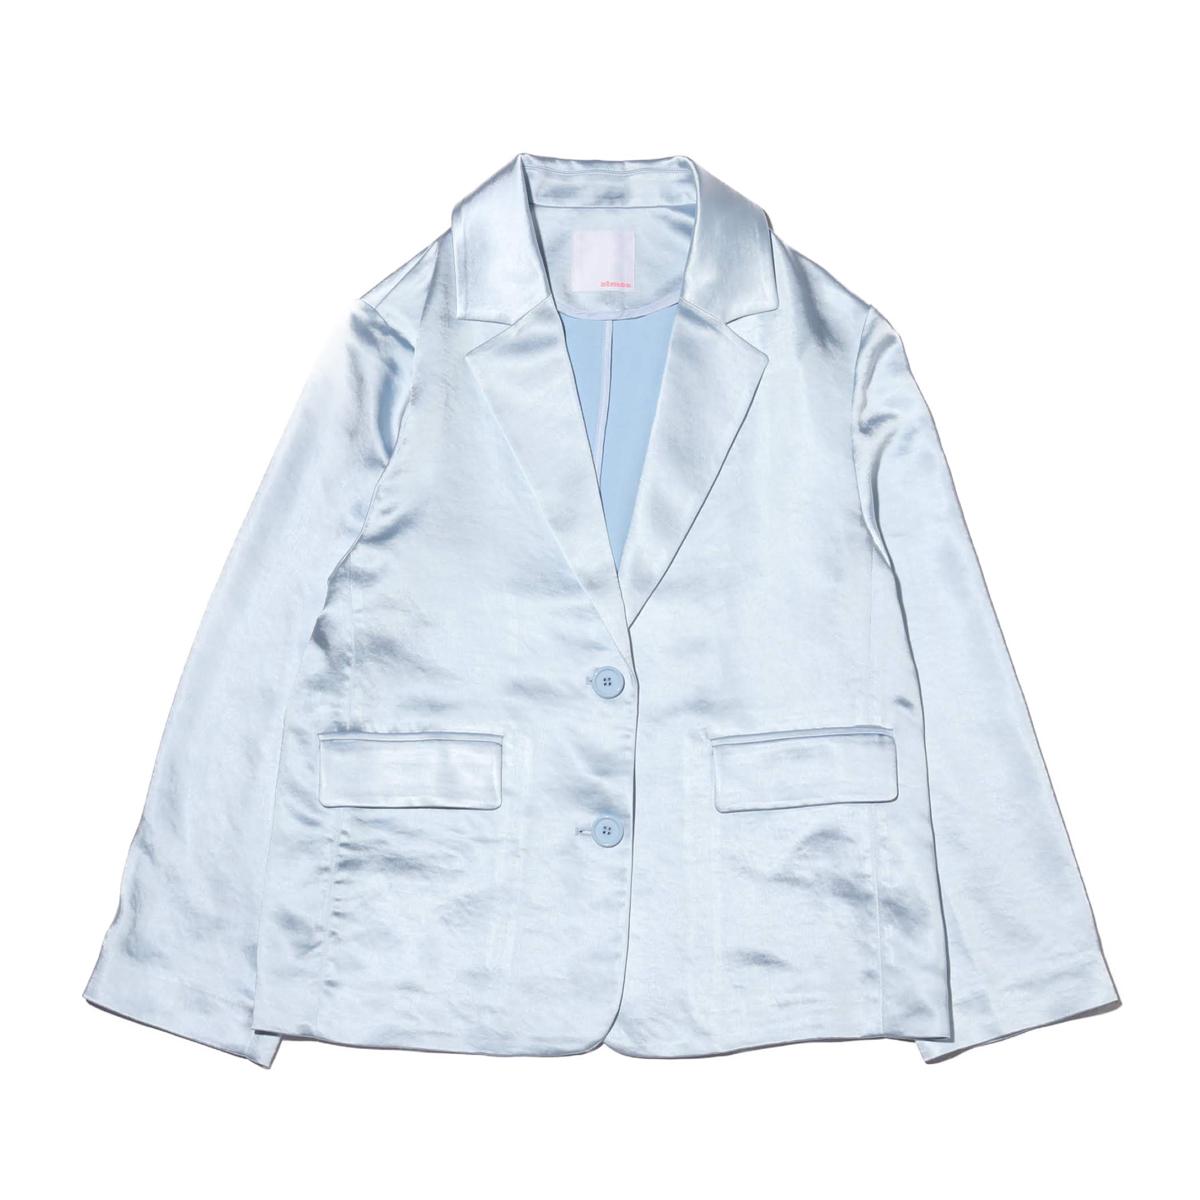 atmos pink サテン セットアップ ジャケット(アトモスピンク サテン セットアップ ジャケット)BLUE【レディース ジャケット】20SP-I